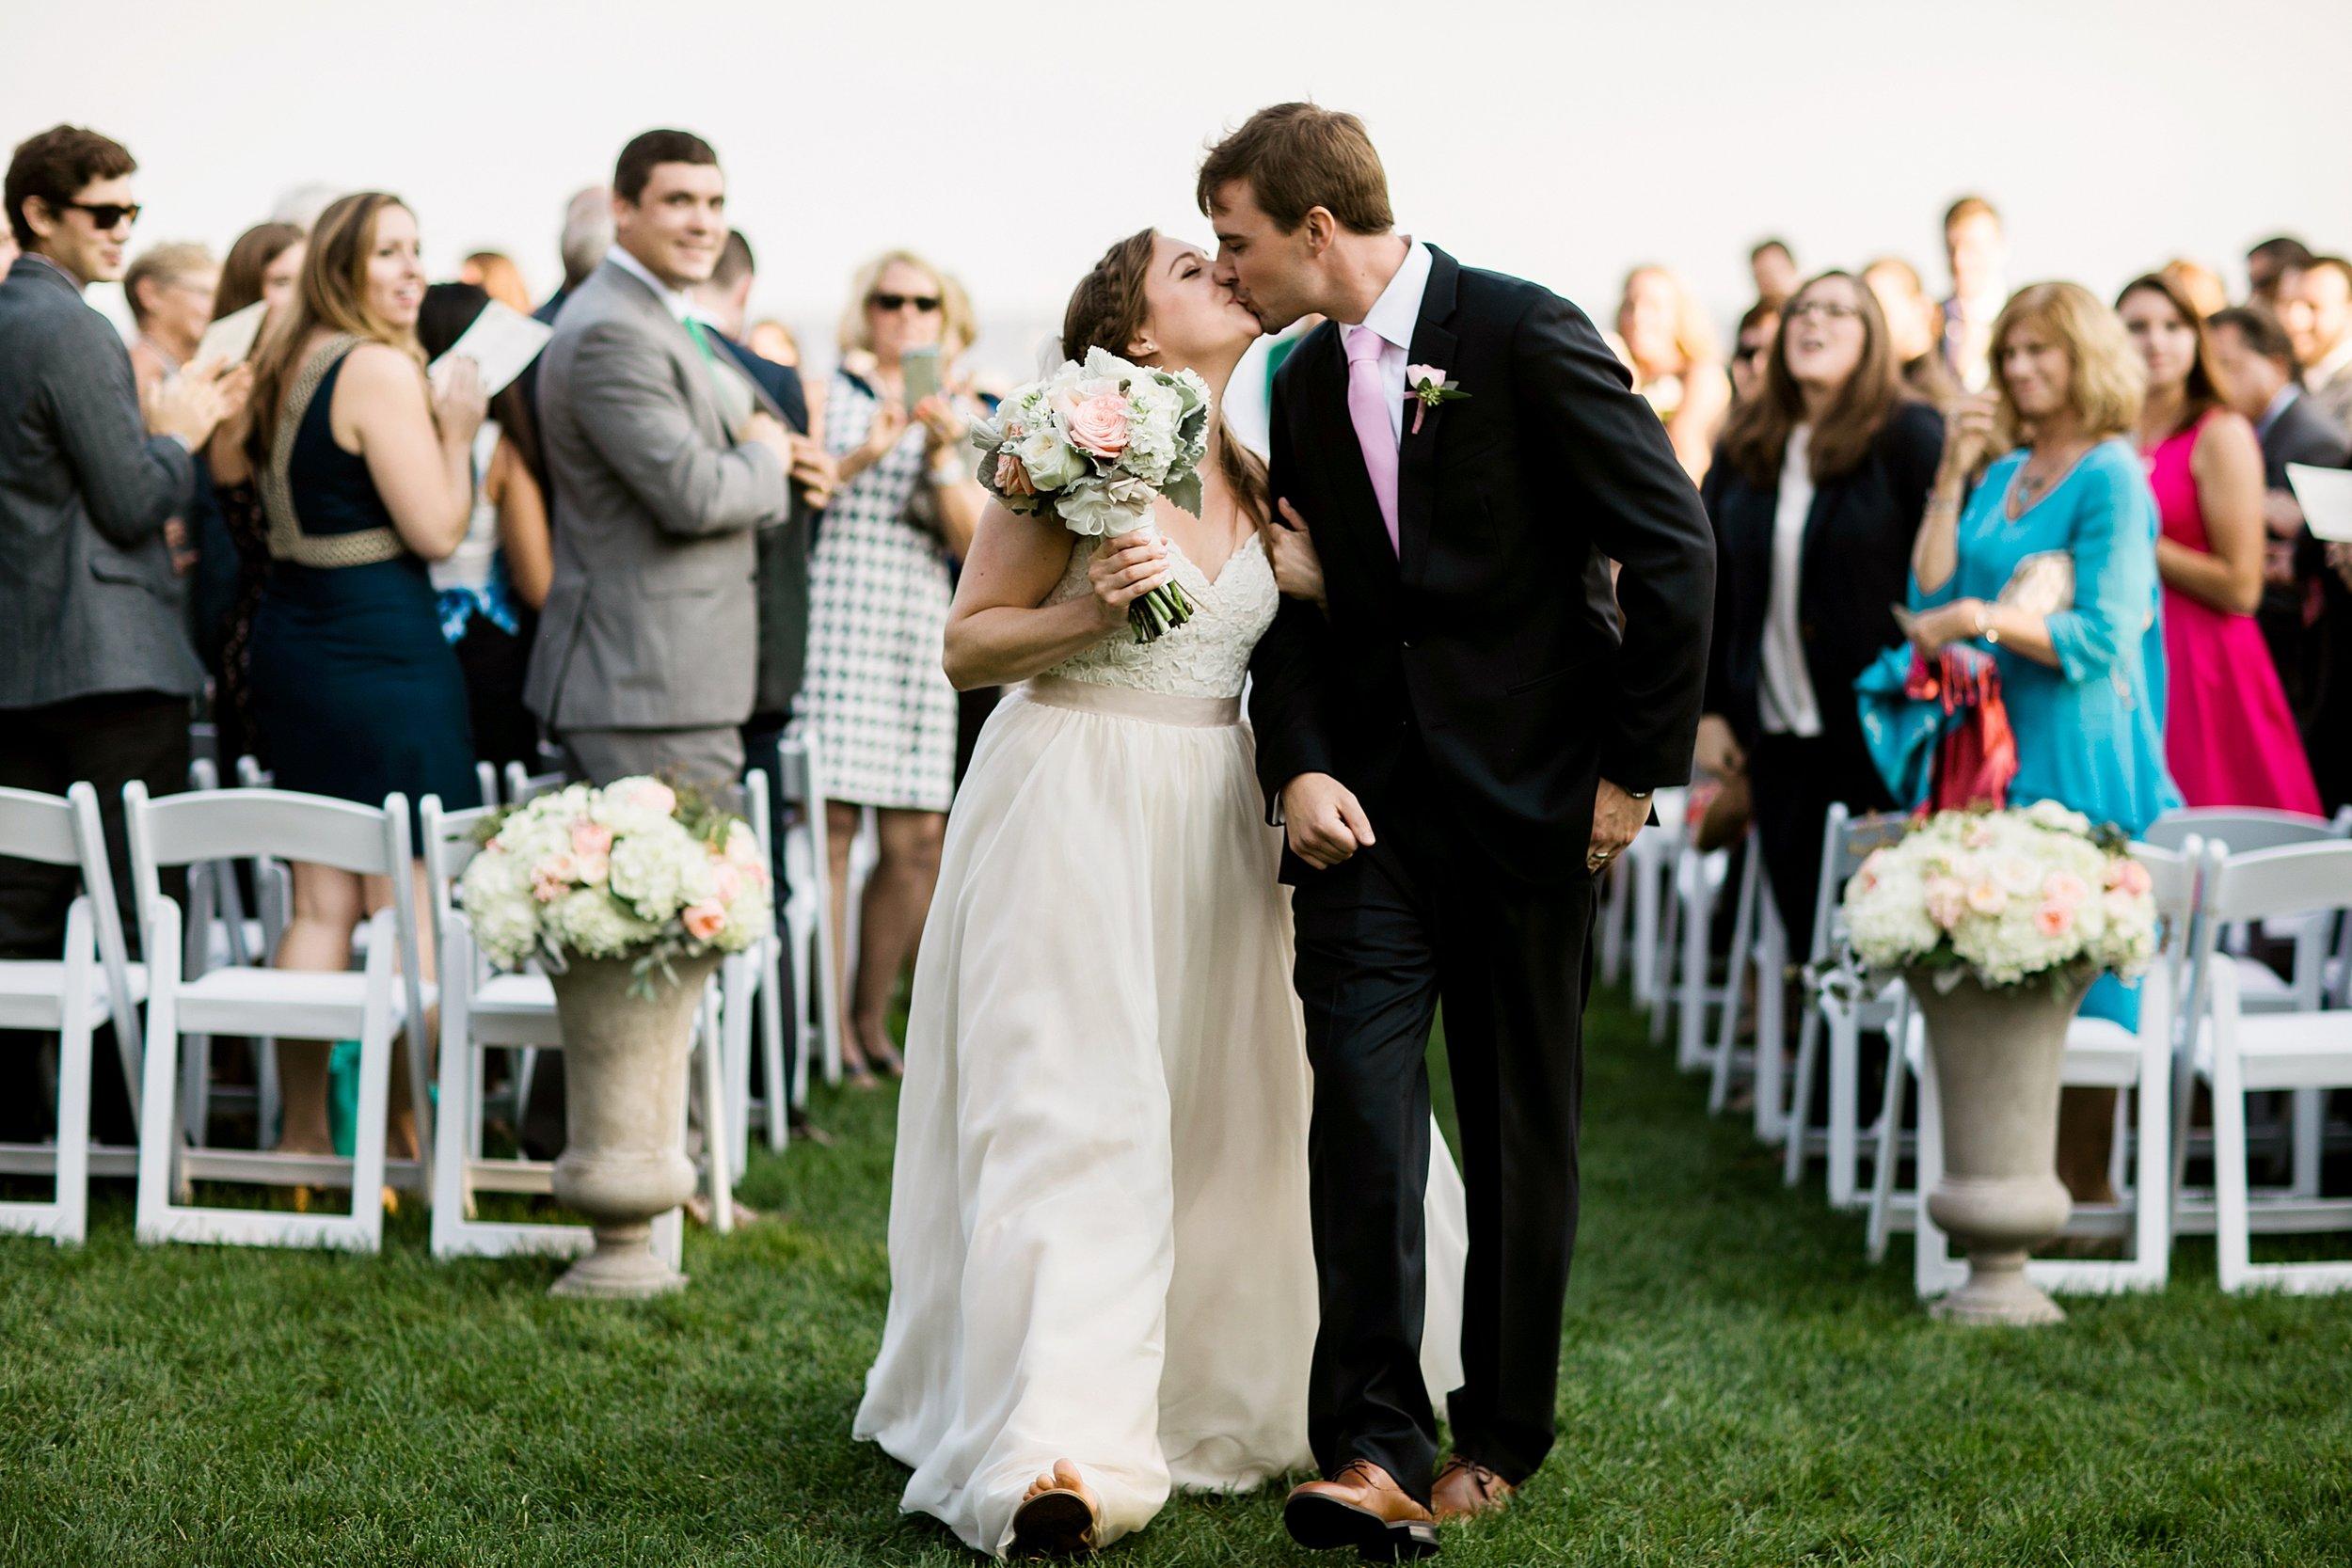 037 los angeles wedding photographer todd danforth photography boston.jpg